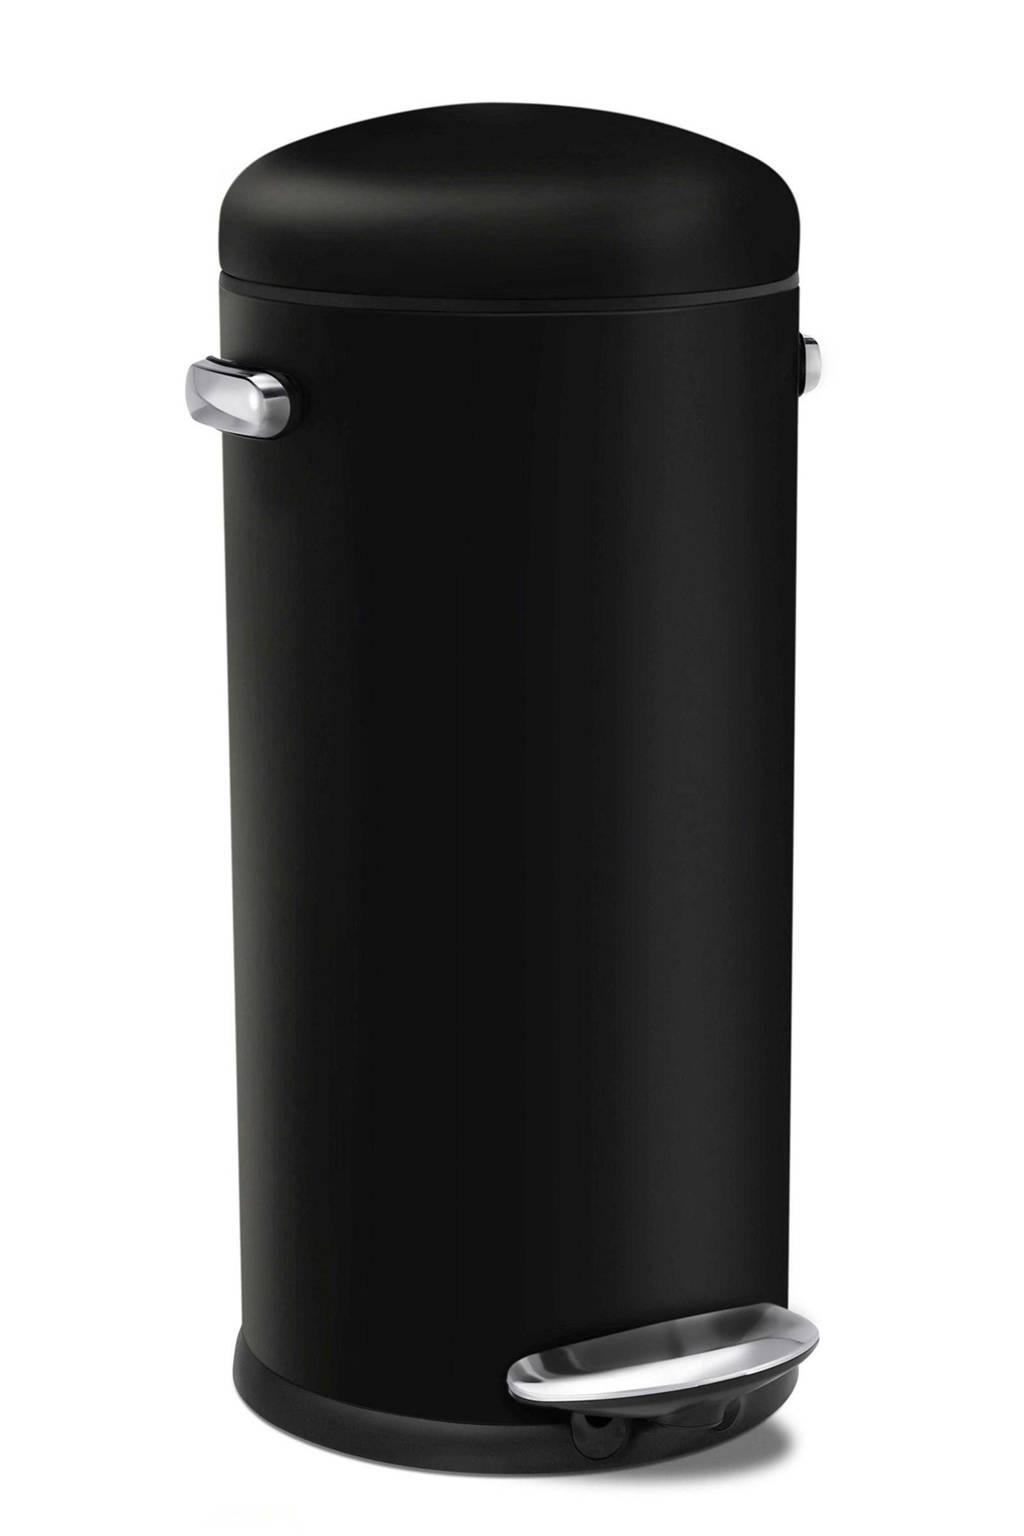 Simplehuman Retro Pedaalemmer 30 L Rvs.Sh011011 Pedaalemmer 30 Liter